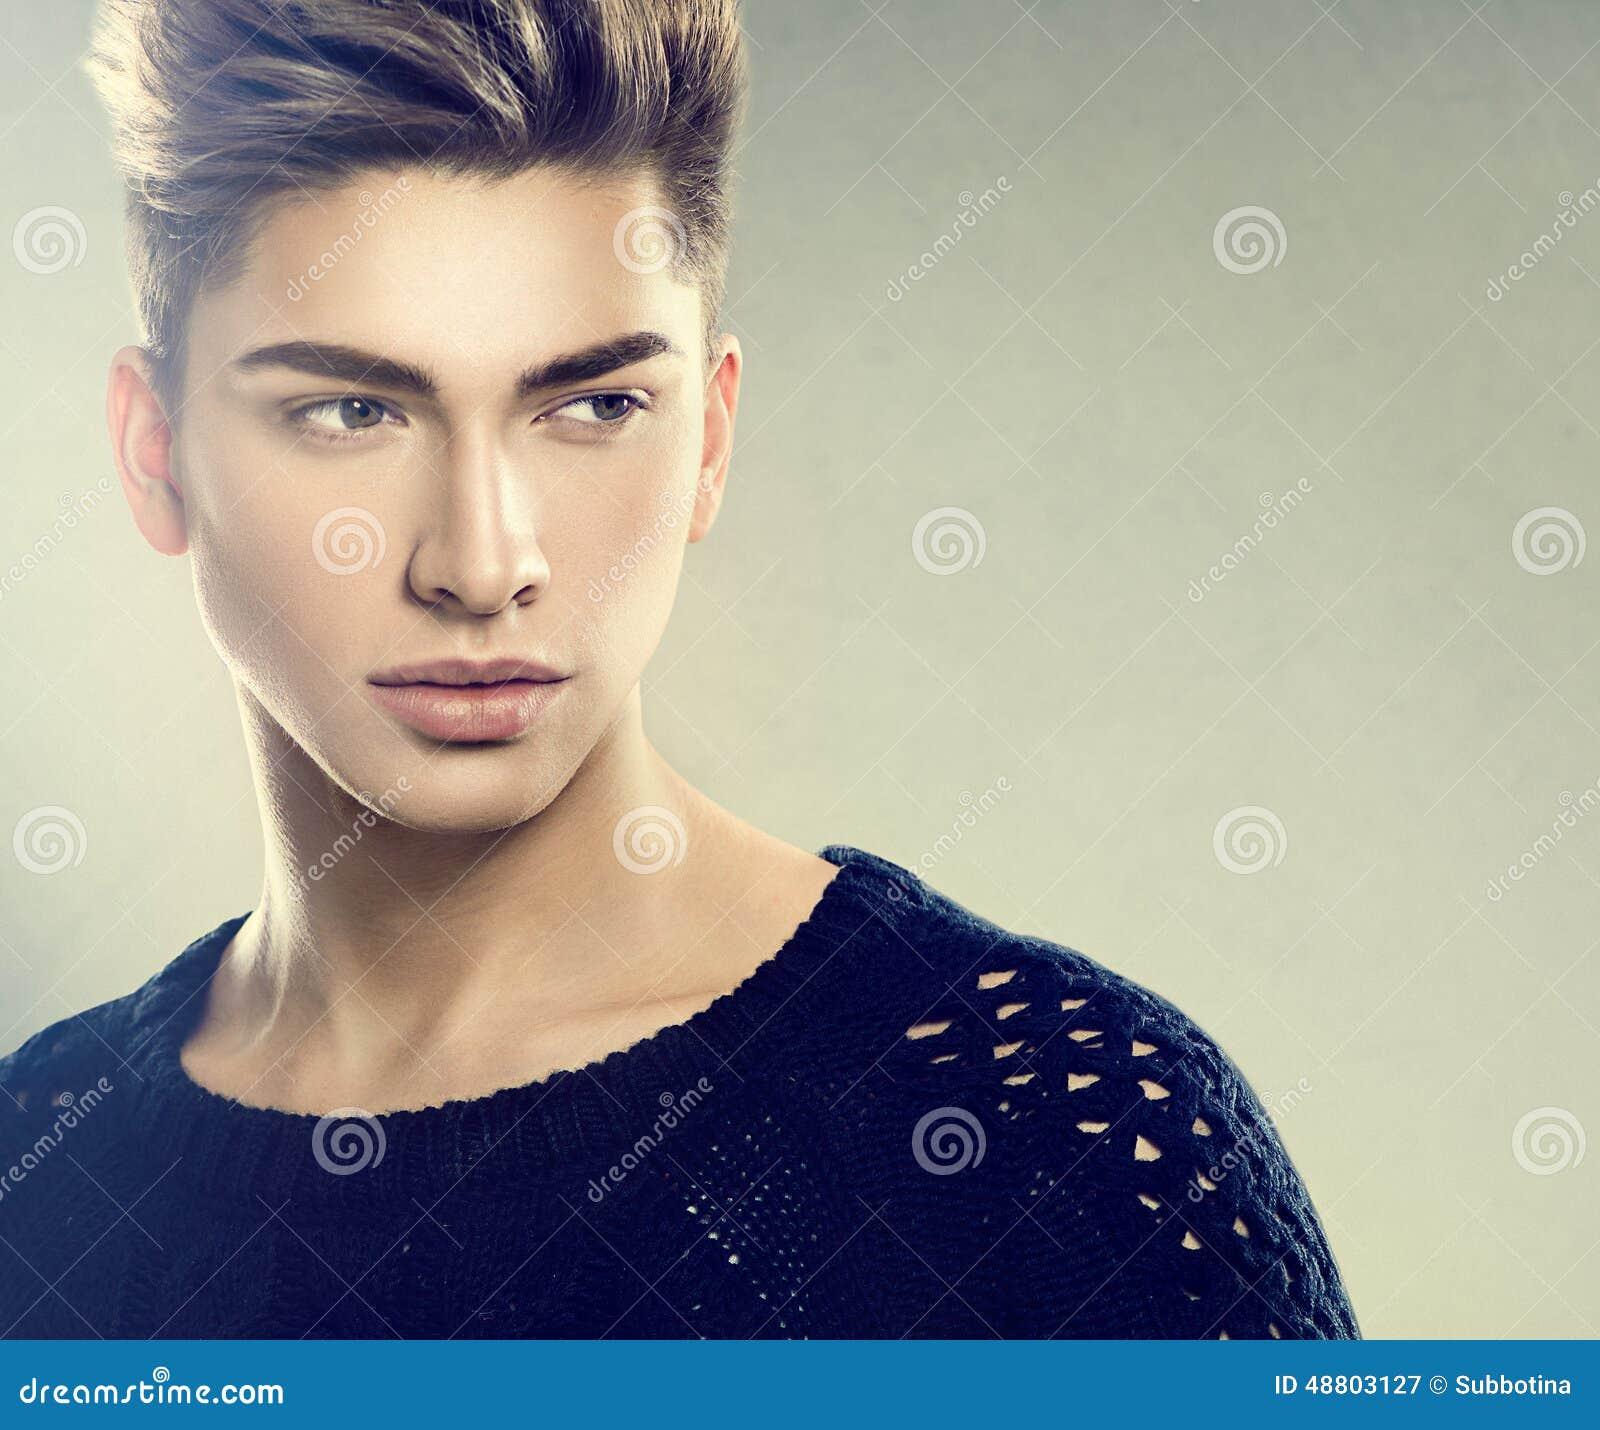 Fashion Young Model Man Portrait Stock Photo Image 48803127